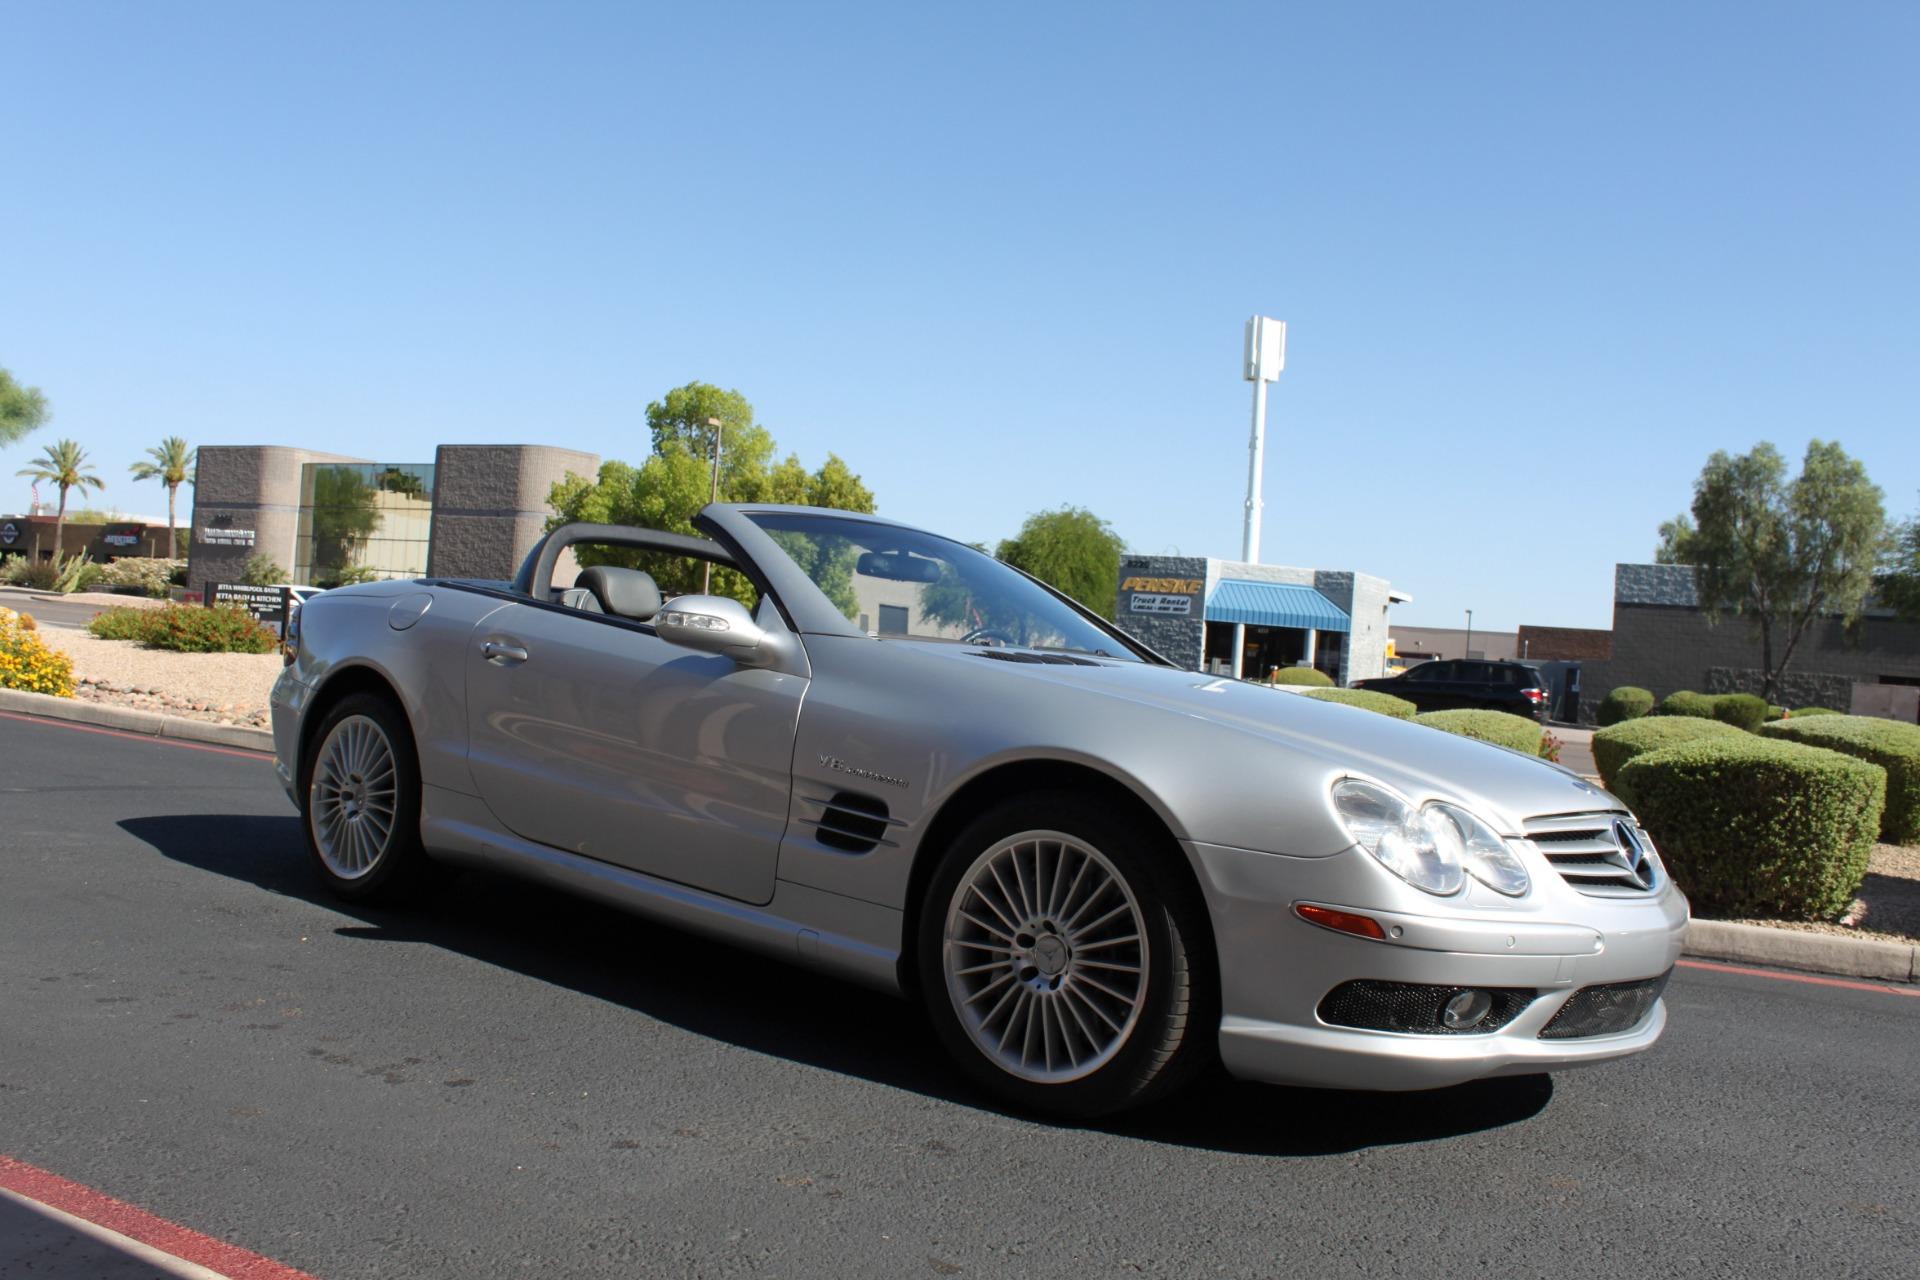 Used-2003-Mercedes-Benz-SL-Class-AMG-Honda